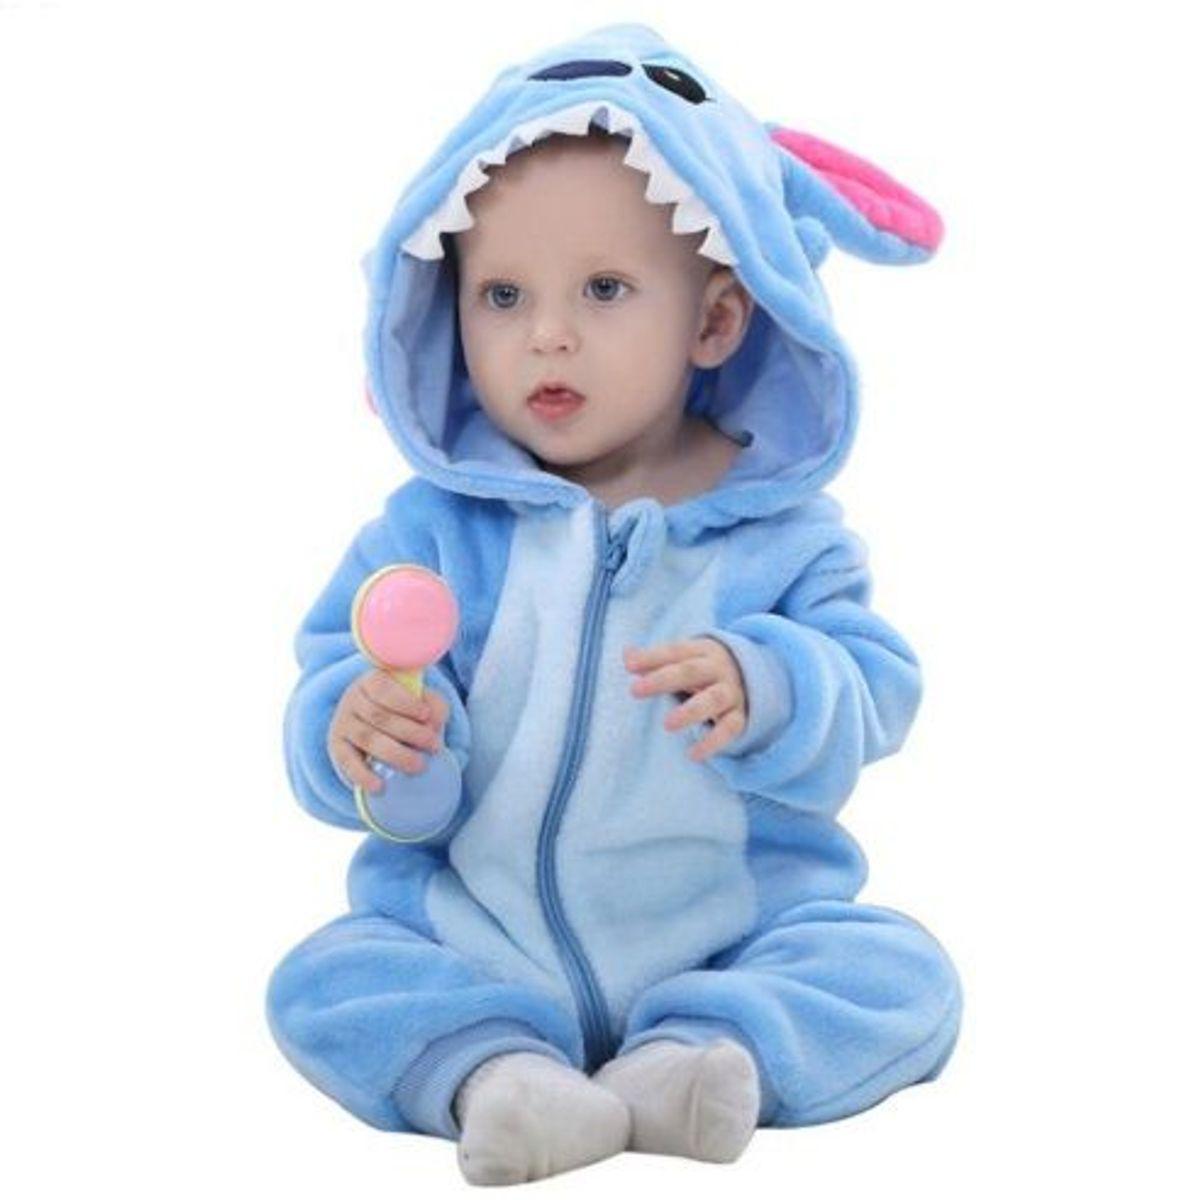 d4b05d304b849f macacão fantasia bebê lilo e stitch hello kitty panda coelho